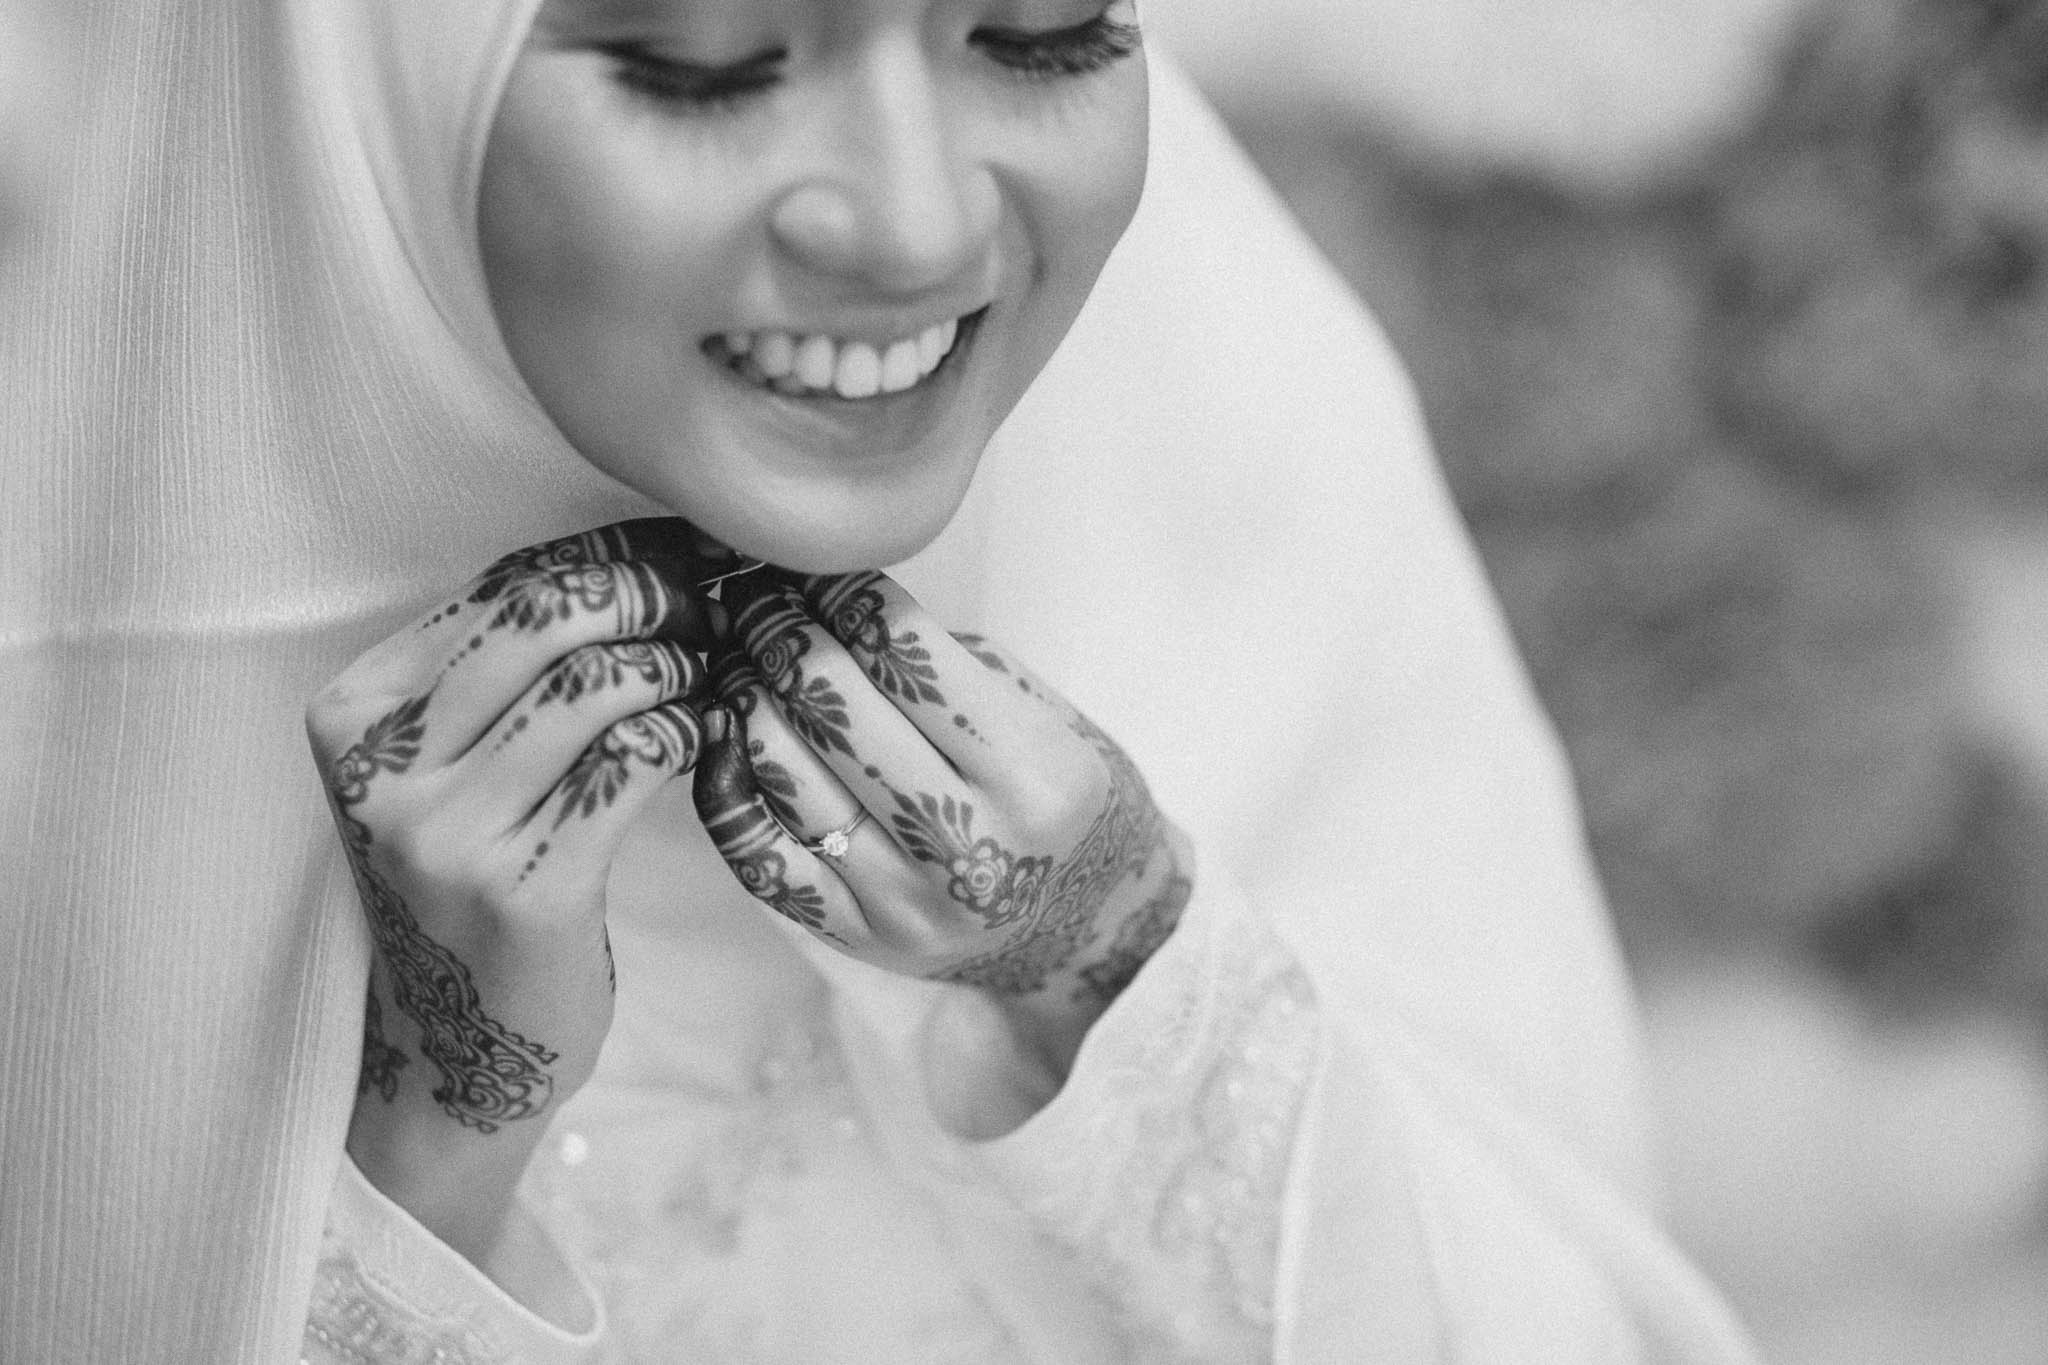 singapore-wedding-photographer-sharalyn-syazwan-004.jpg